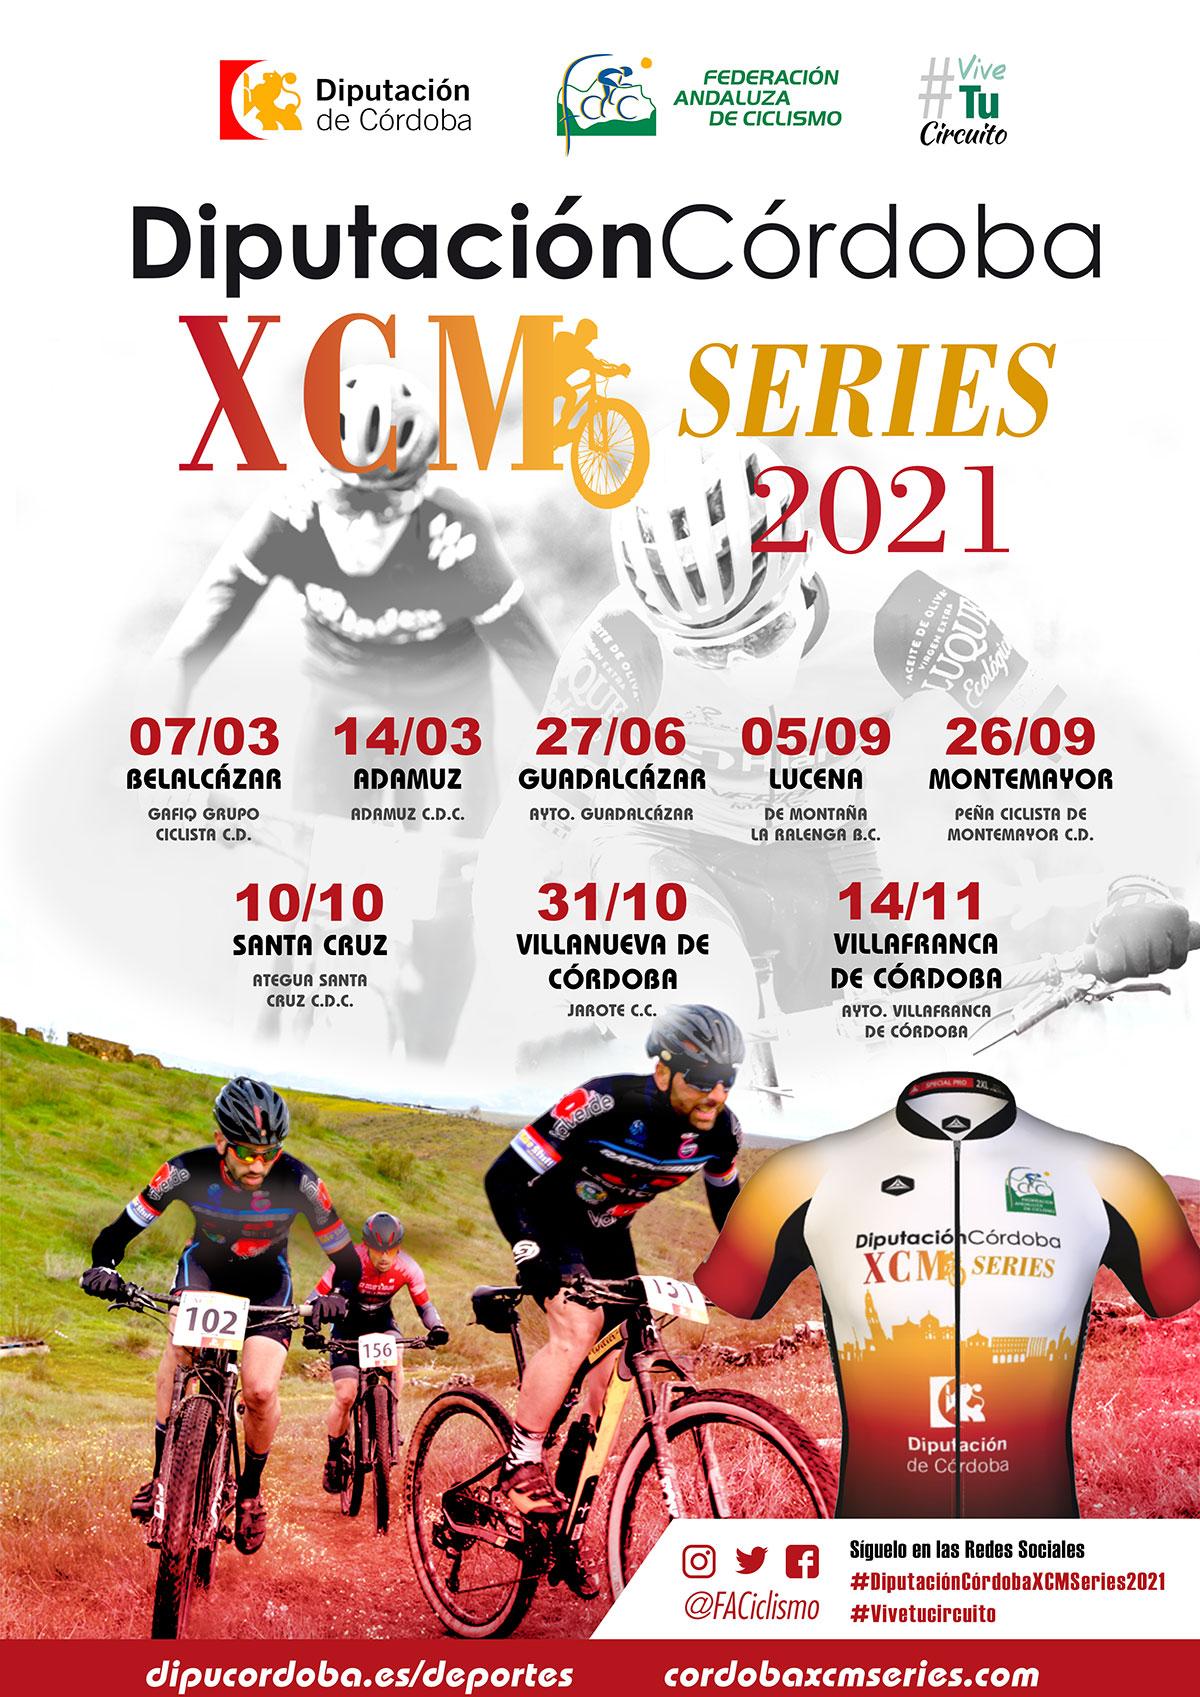 Las 'DiputaciónCórdoba XCM Series 2021' regresan con la I Media Maratón Guadalcázar